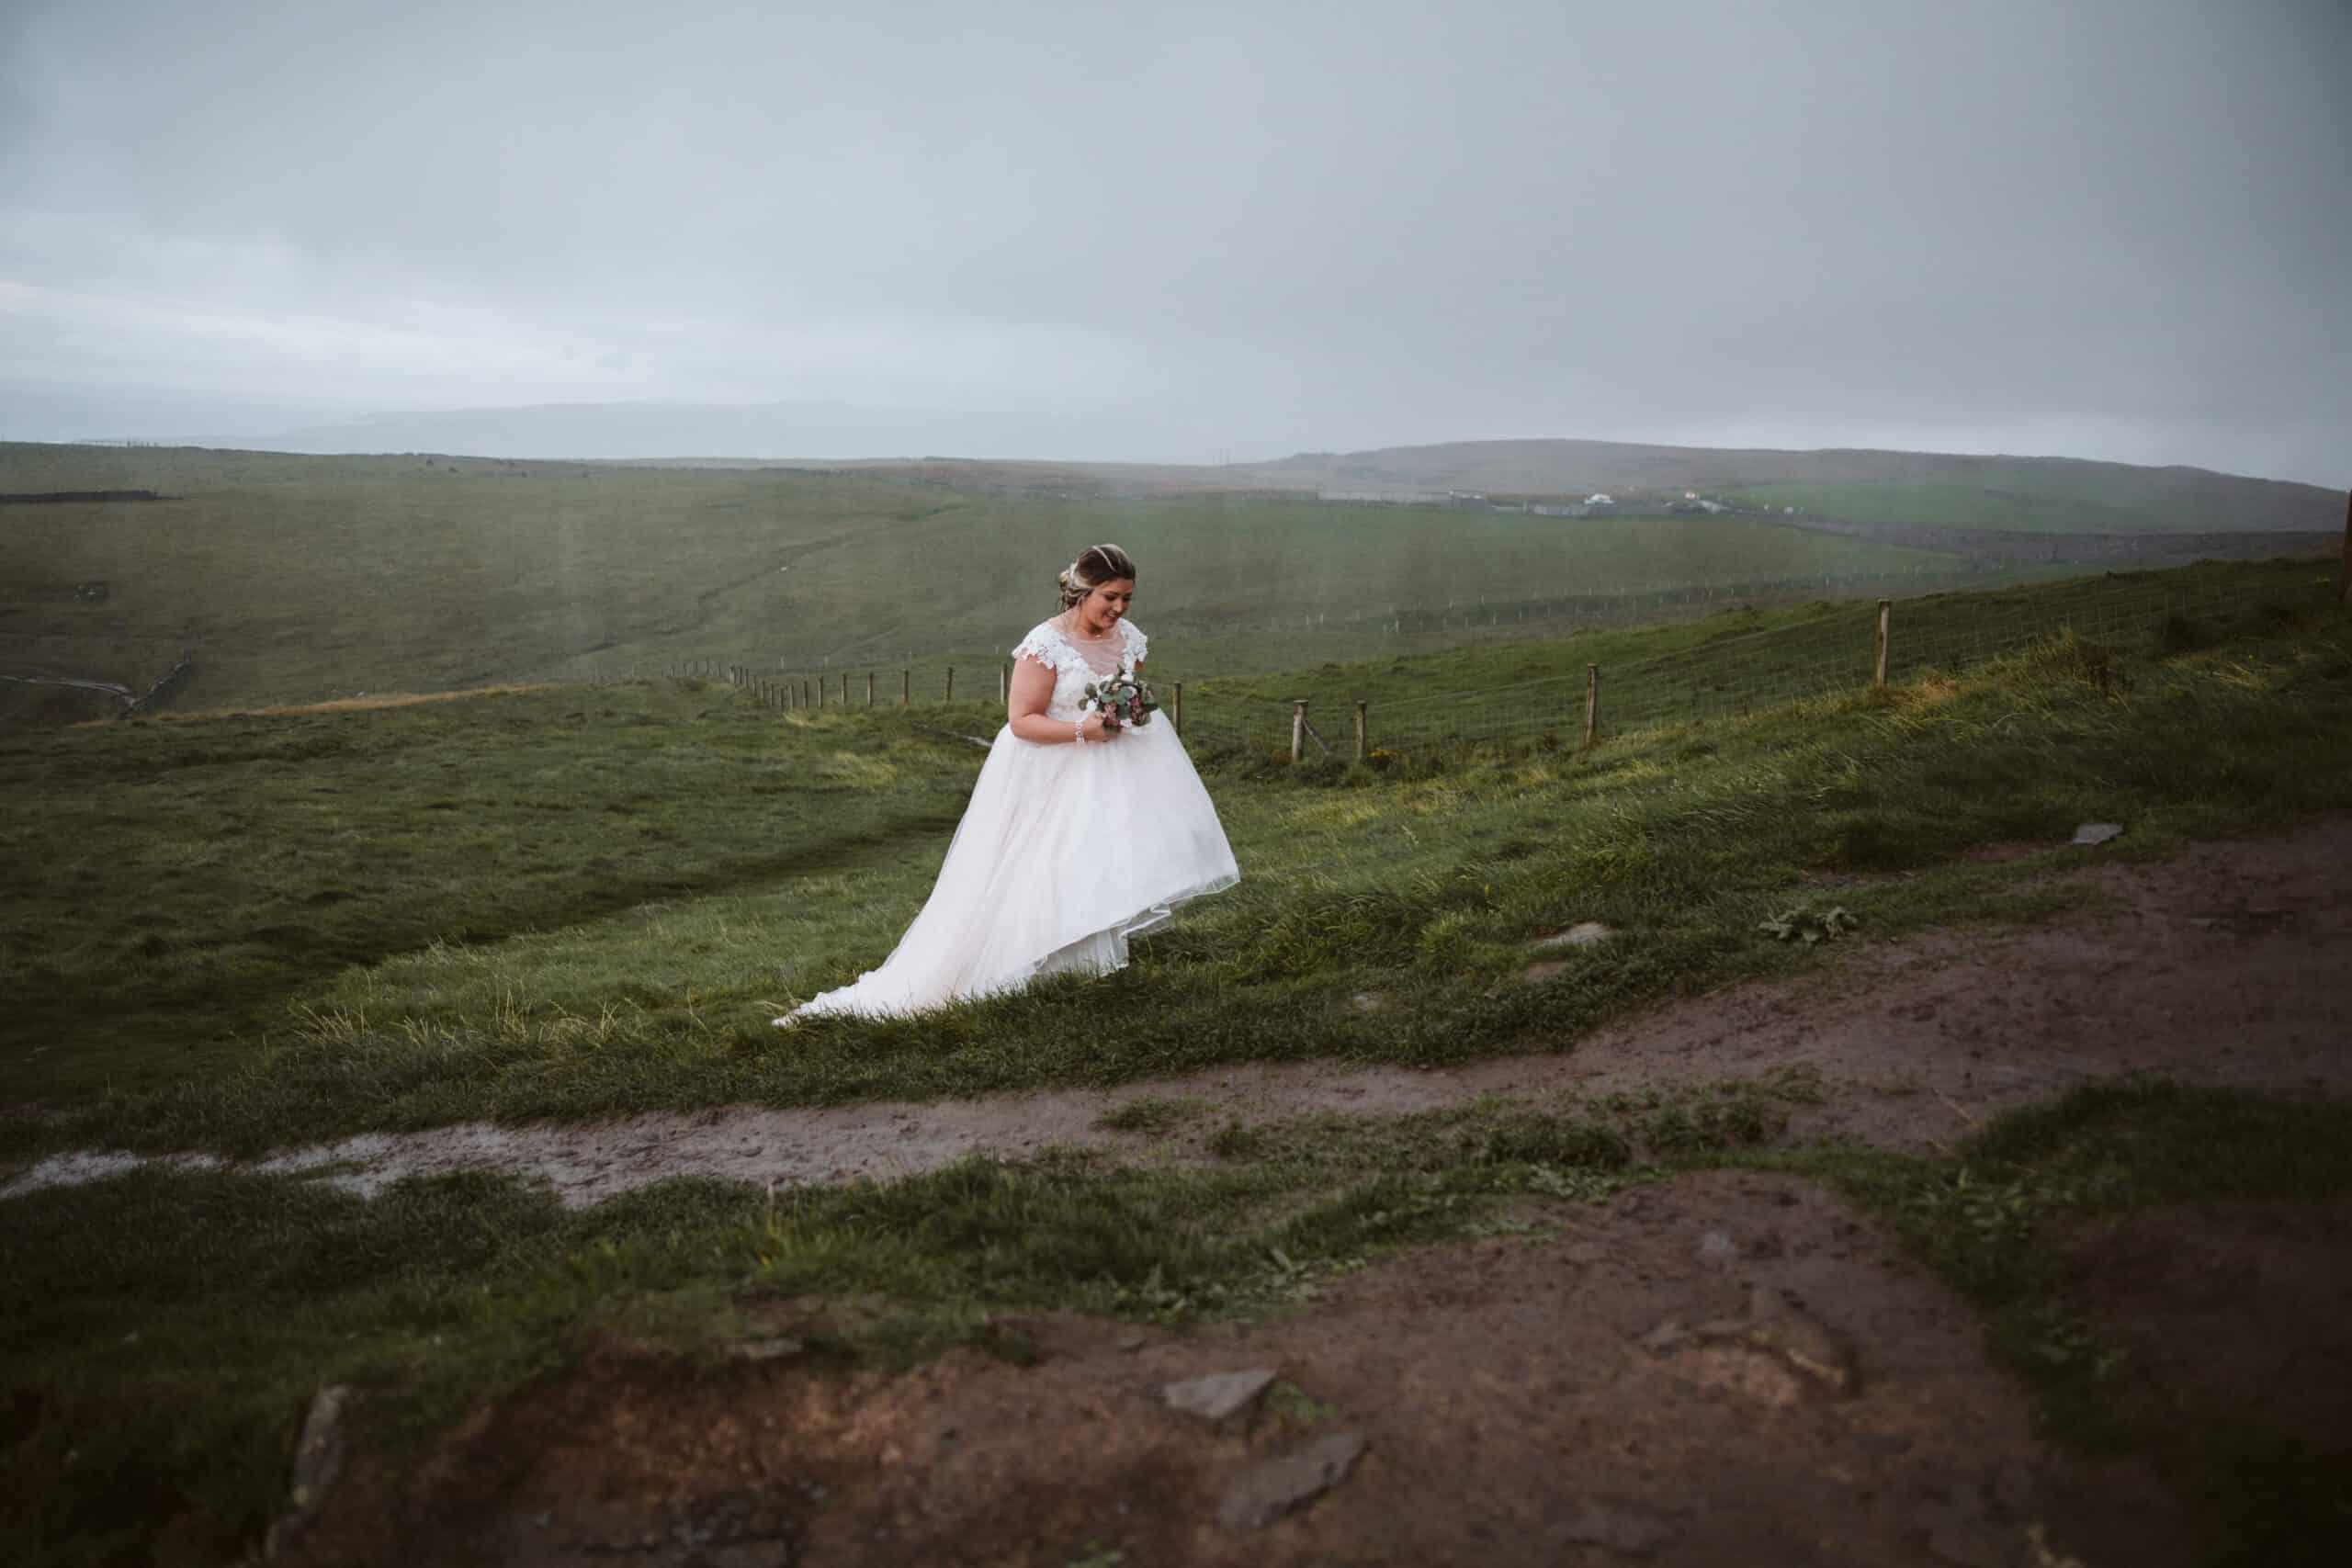 Cliffs of Moher Wedding Hags head, bride climbing a hill in dress